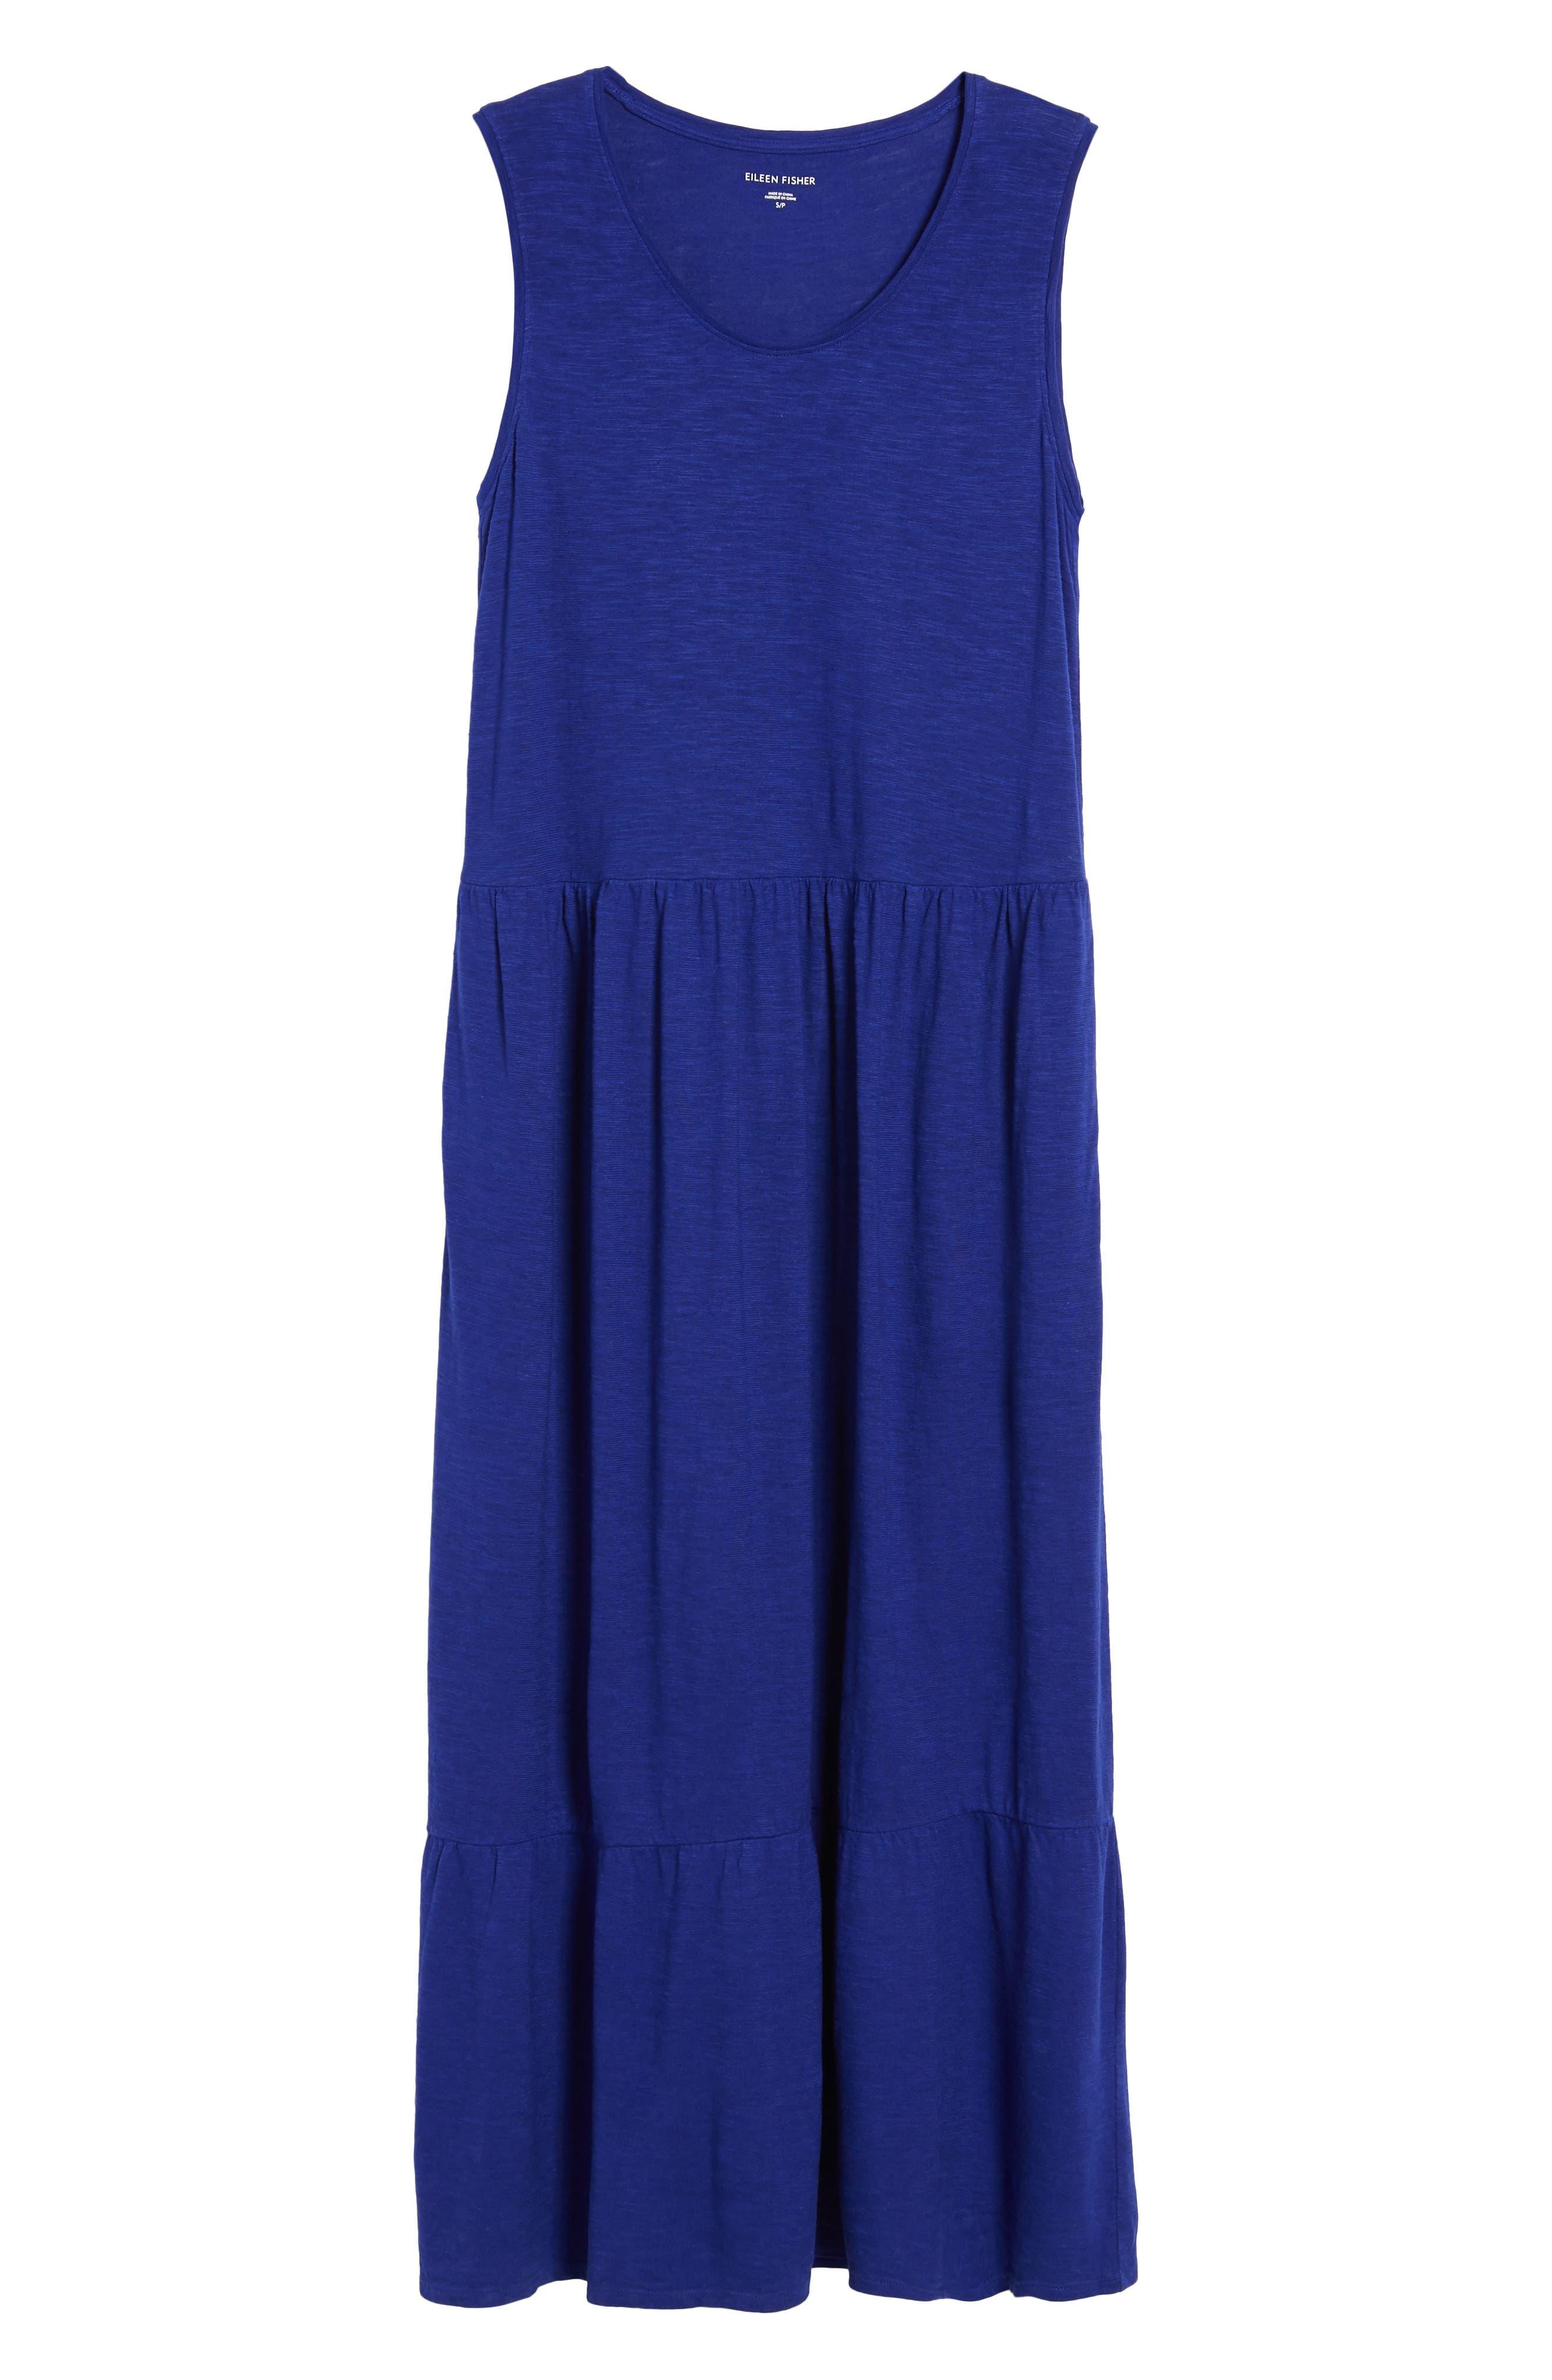 Scooped Neck Hemp & Cotton Midi Dress,                             Alternate thumbnail 6, color,                             Blue Violet